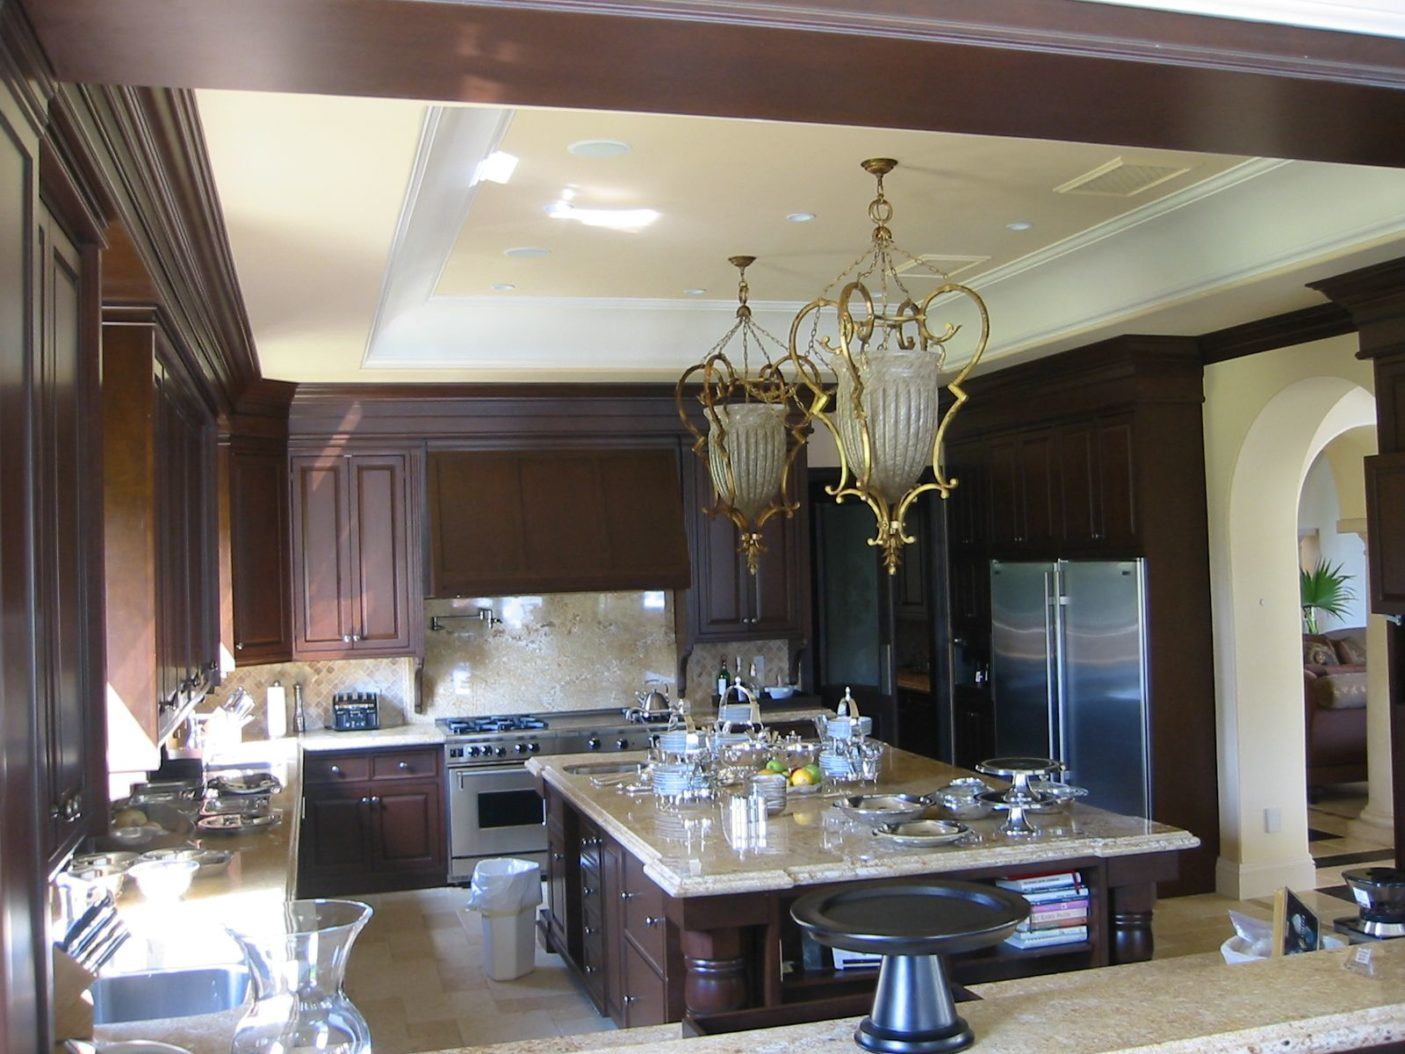 Kitchens-105.jpg